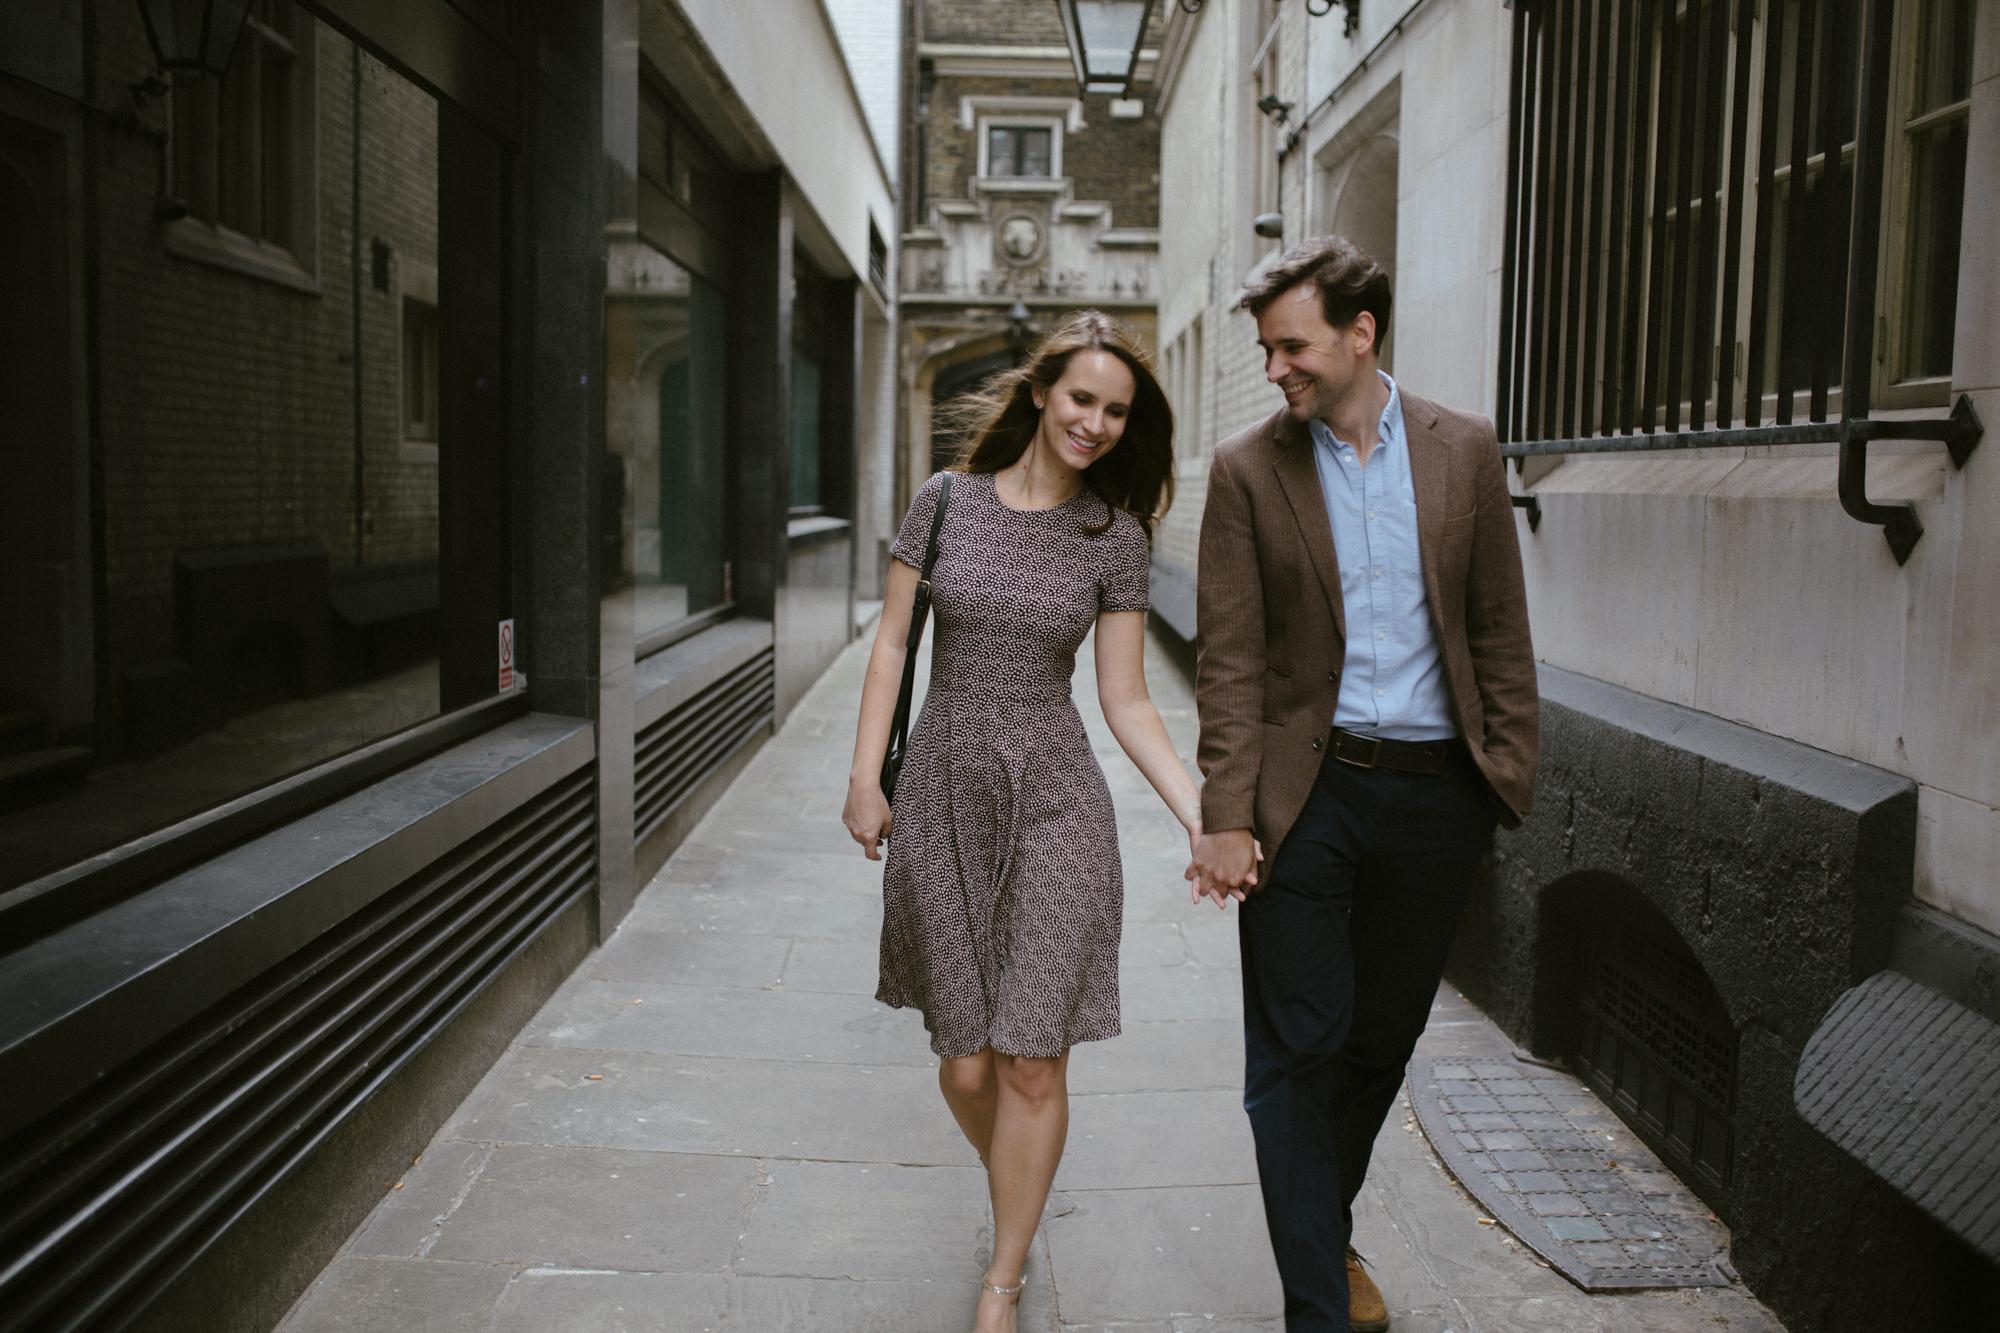 london-engagement-24.jpg